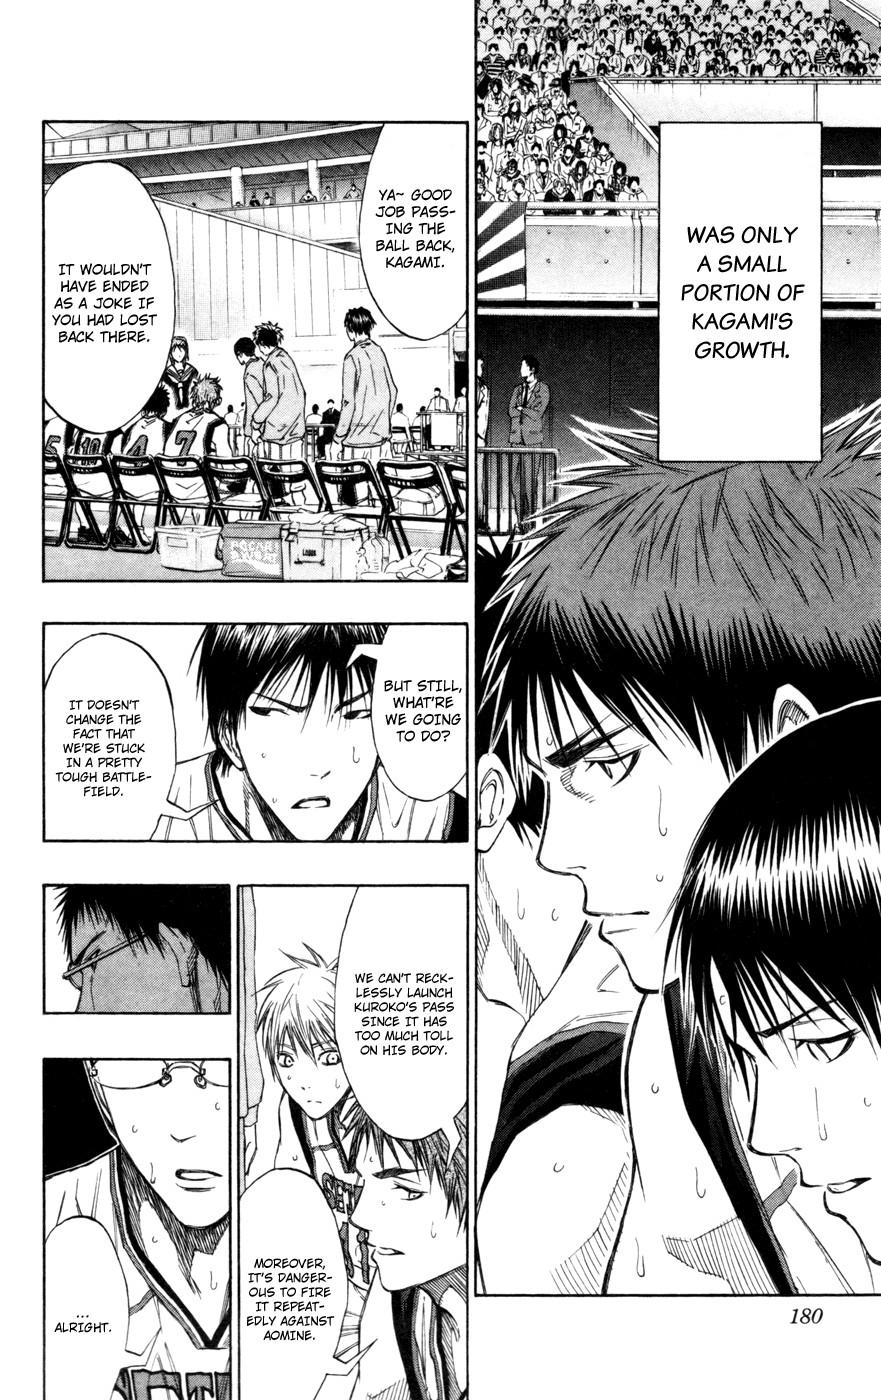 Kuroko no Basket Manga Chapter 117 - Image 3_180